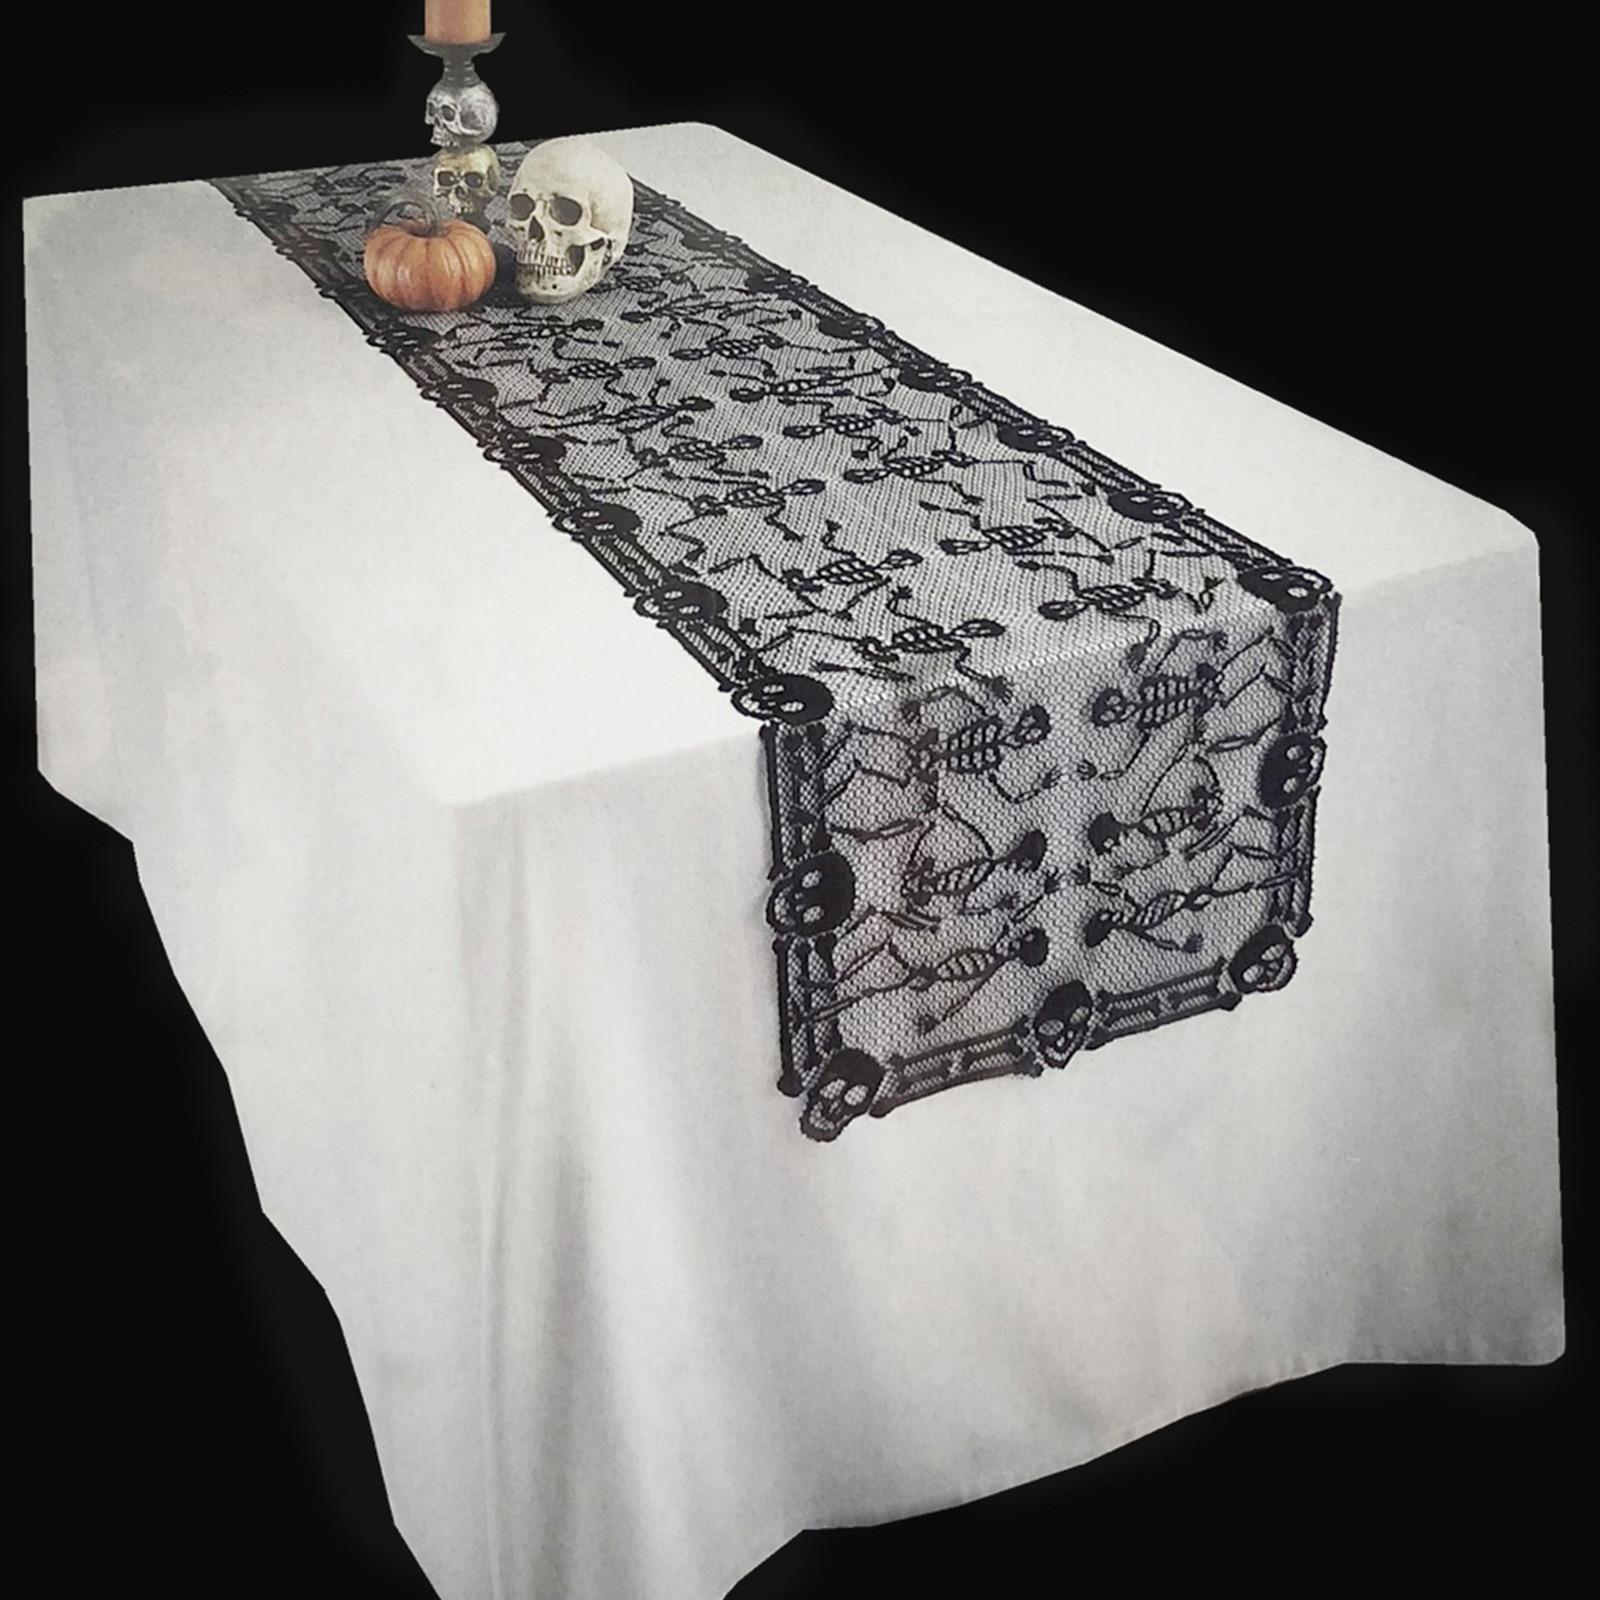 Black Spider Web Horror Skull Skeleton Web Table Runner Dining Table Cover Tablecloth For Festival Halloween Party Decoration